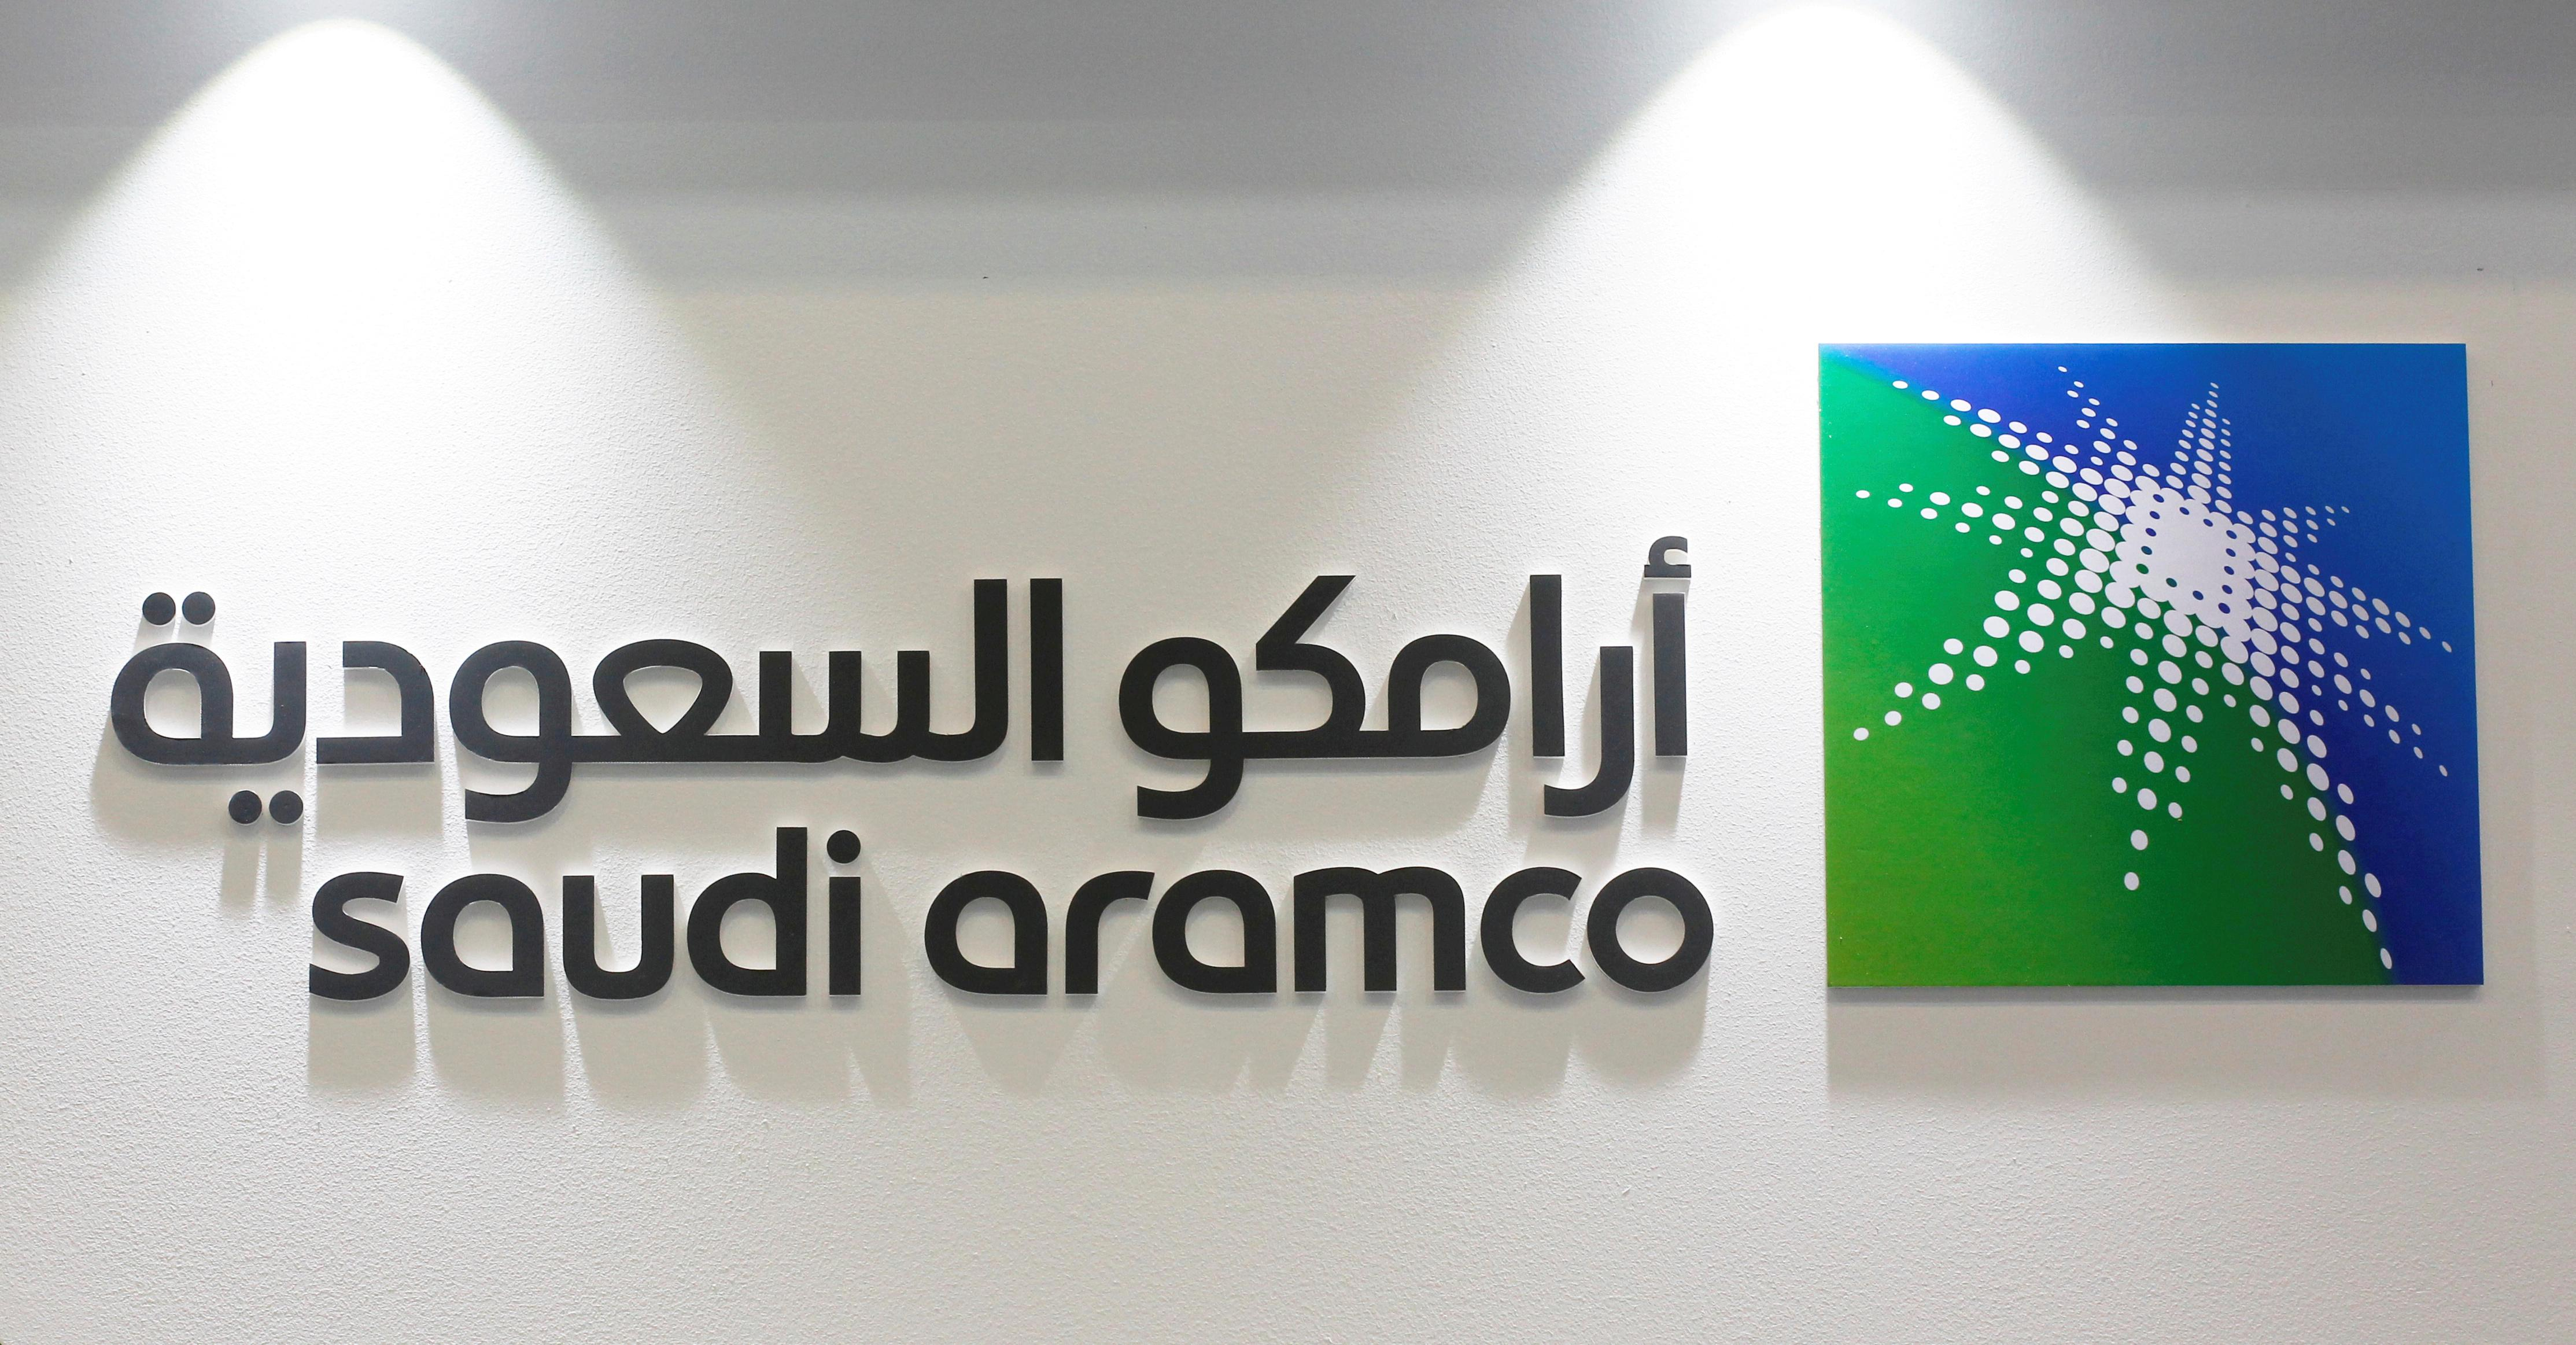 Saudi Aramco to buy SABIC in $69 billion chemicals megadeal